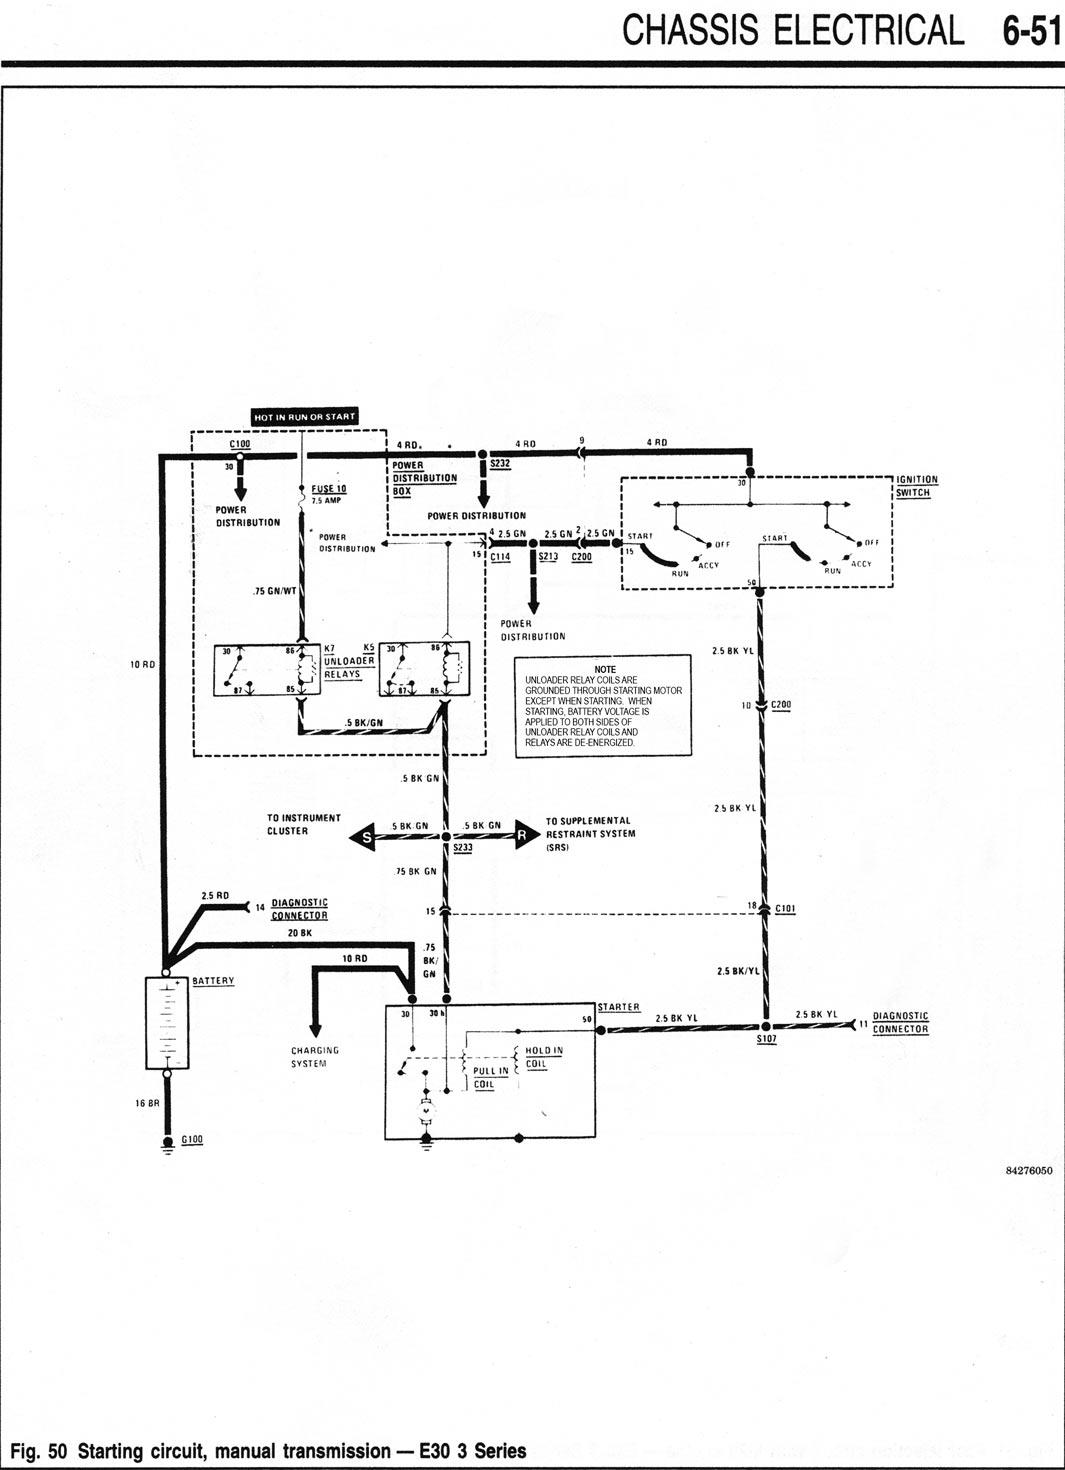 Boat Starter Wiring Diagram 91 E30 318is M42 Crank No Start